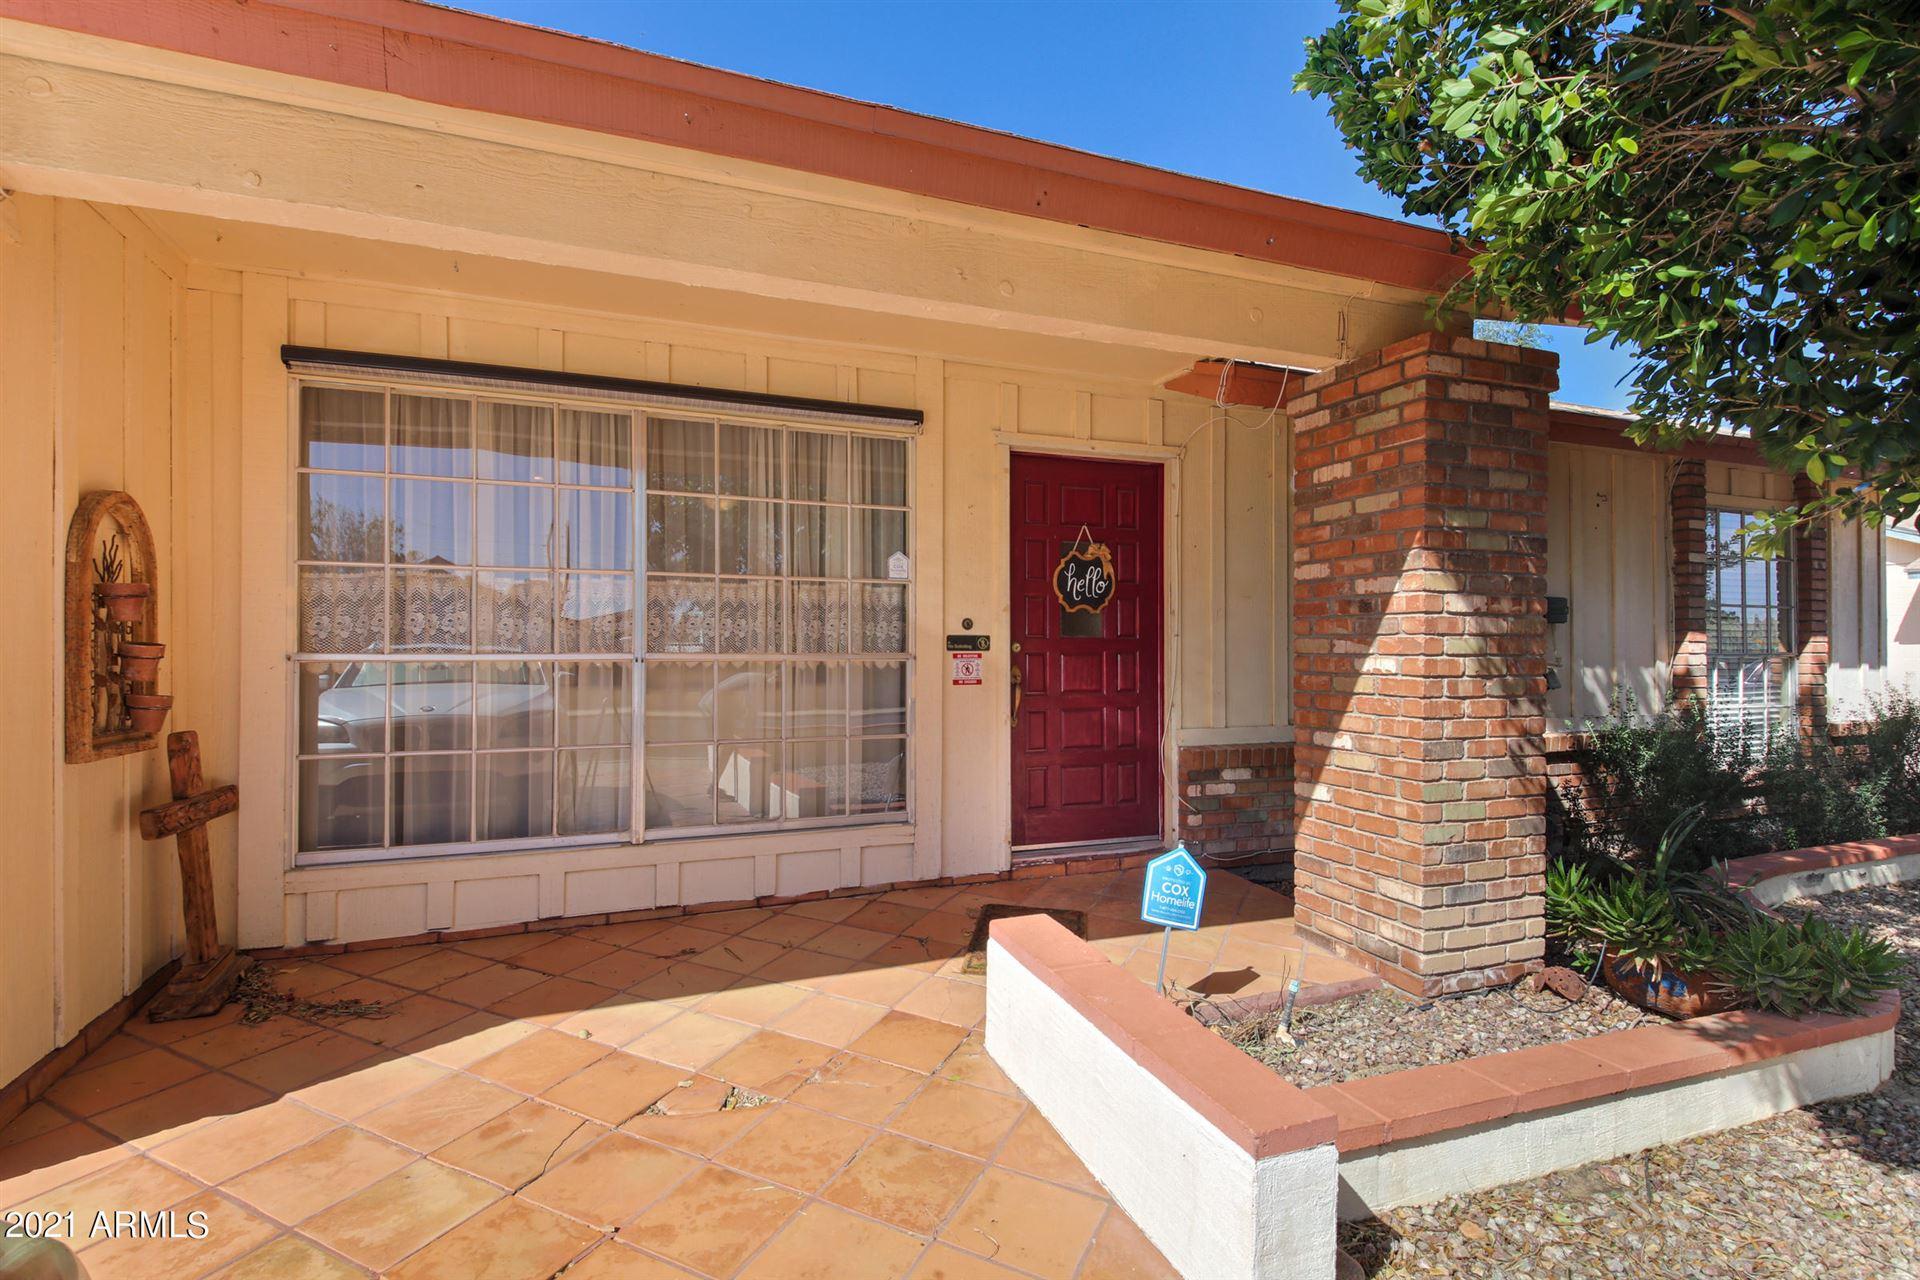 Photo of 1004 E GREENWAY Street, Mesa, AZ 85203 (MLS # 6203723)